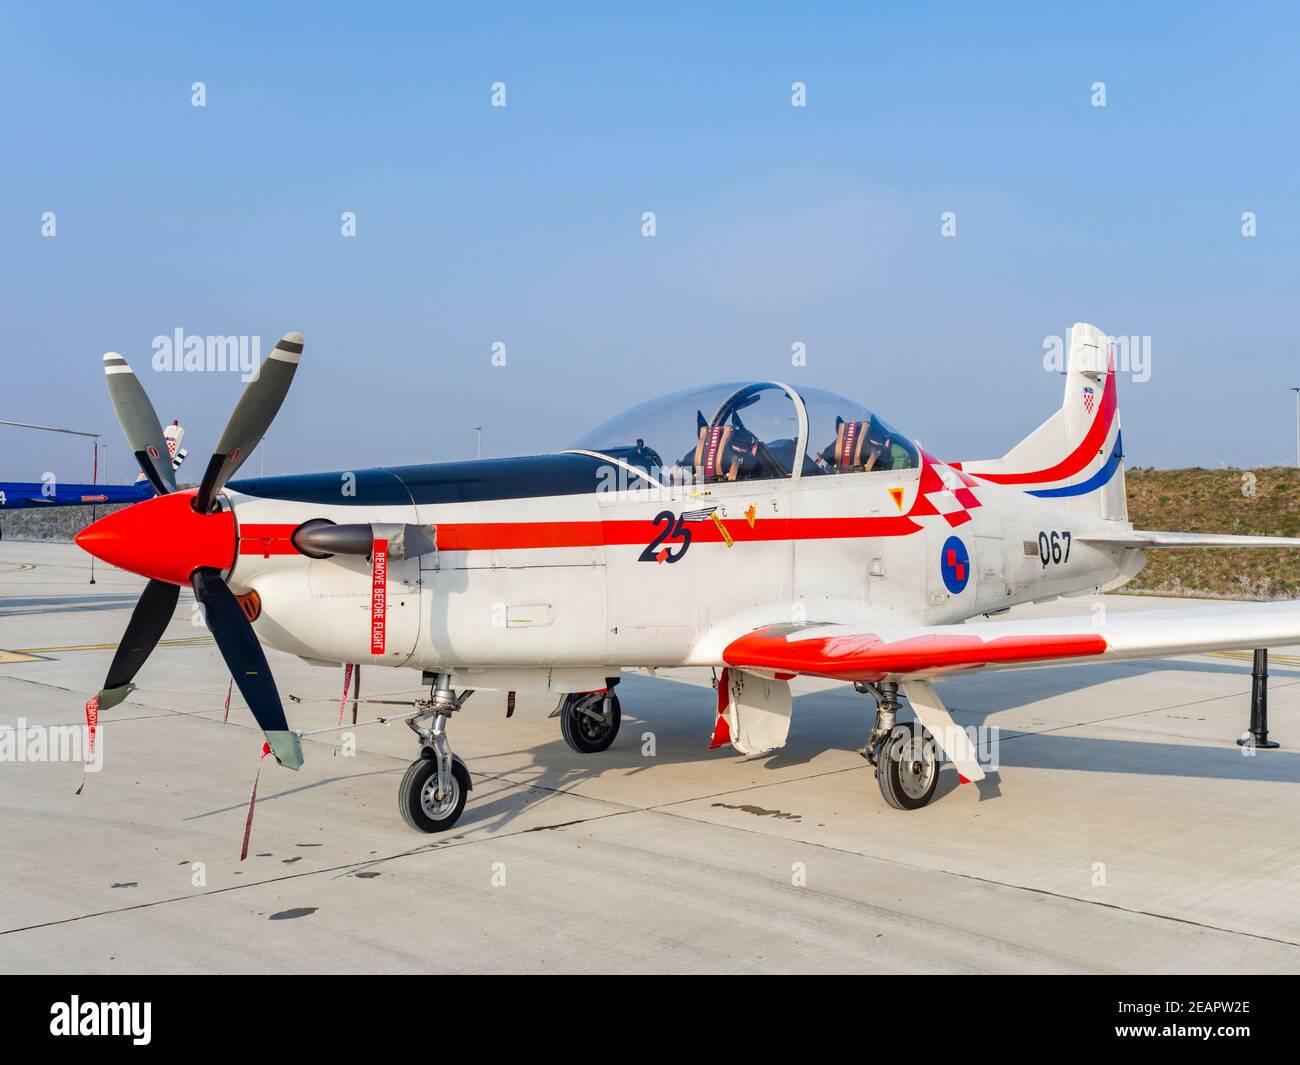 Croatian Pilatus PC-9 067 of Krila oluje Wings of storm aerobatic group 25 years of HRZ number marking Stock Photo